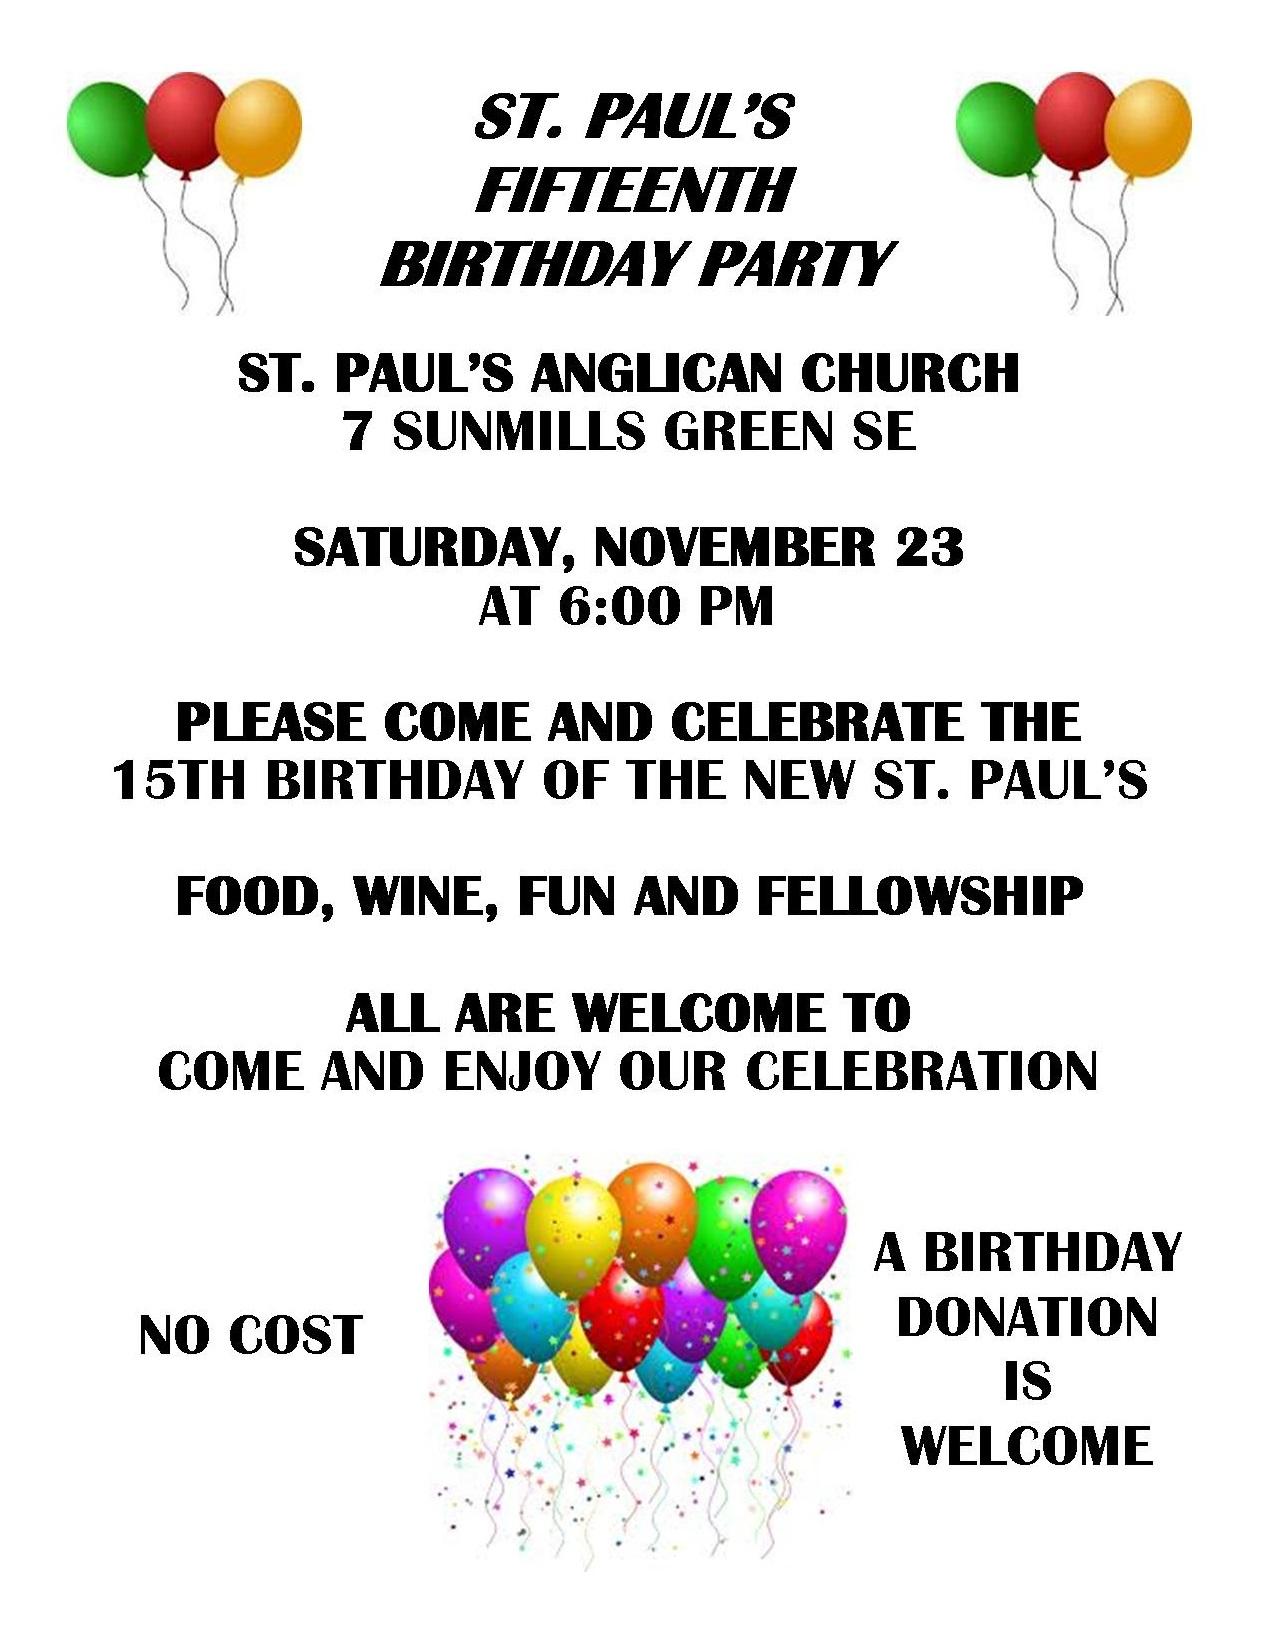 fifteenth birthday party on november 23